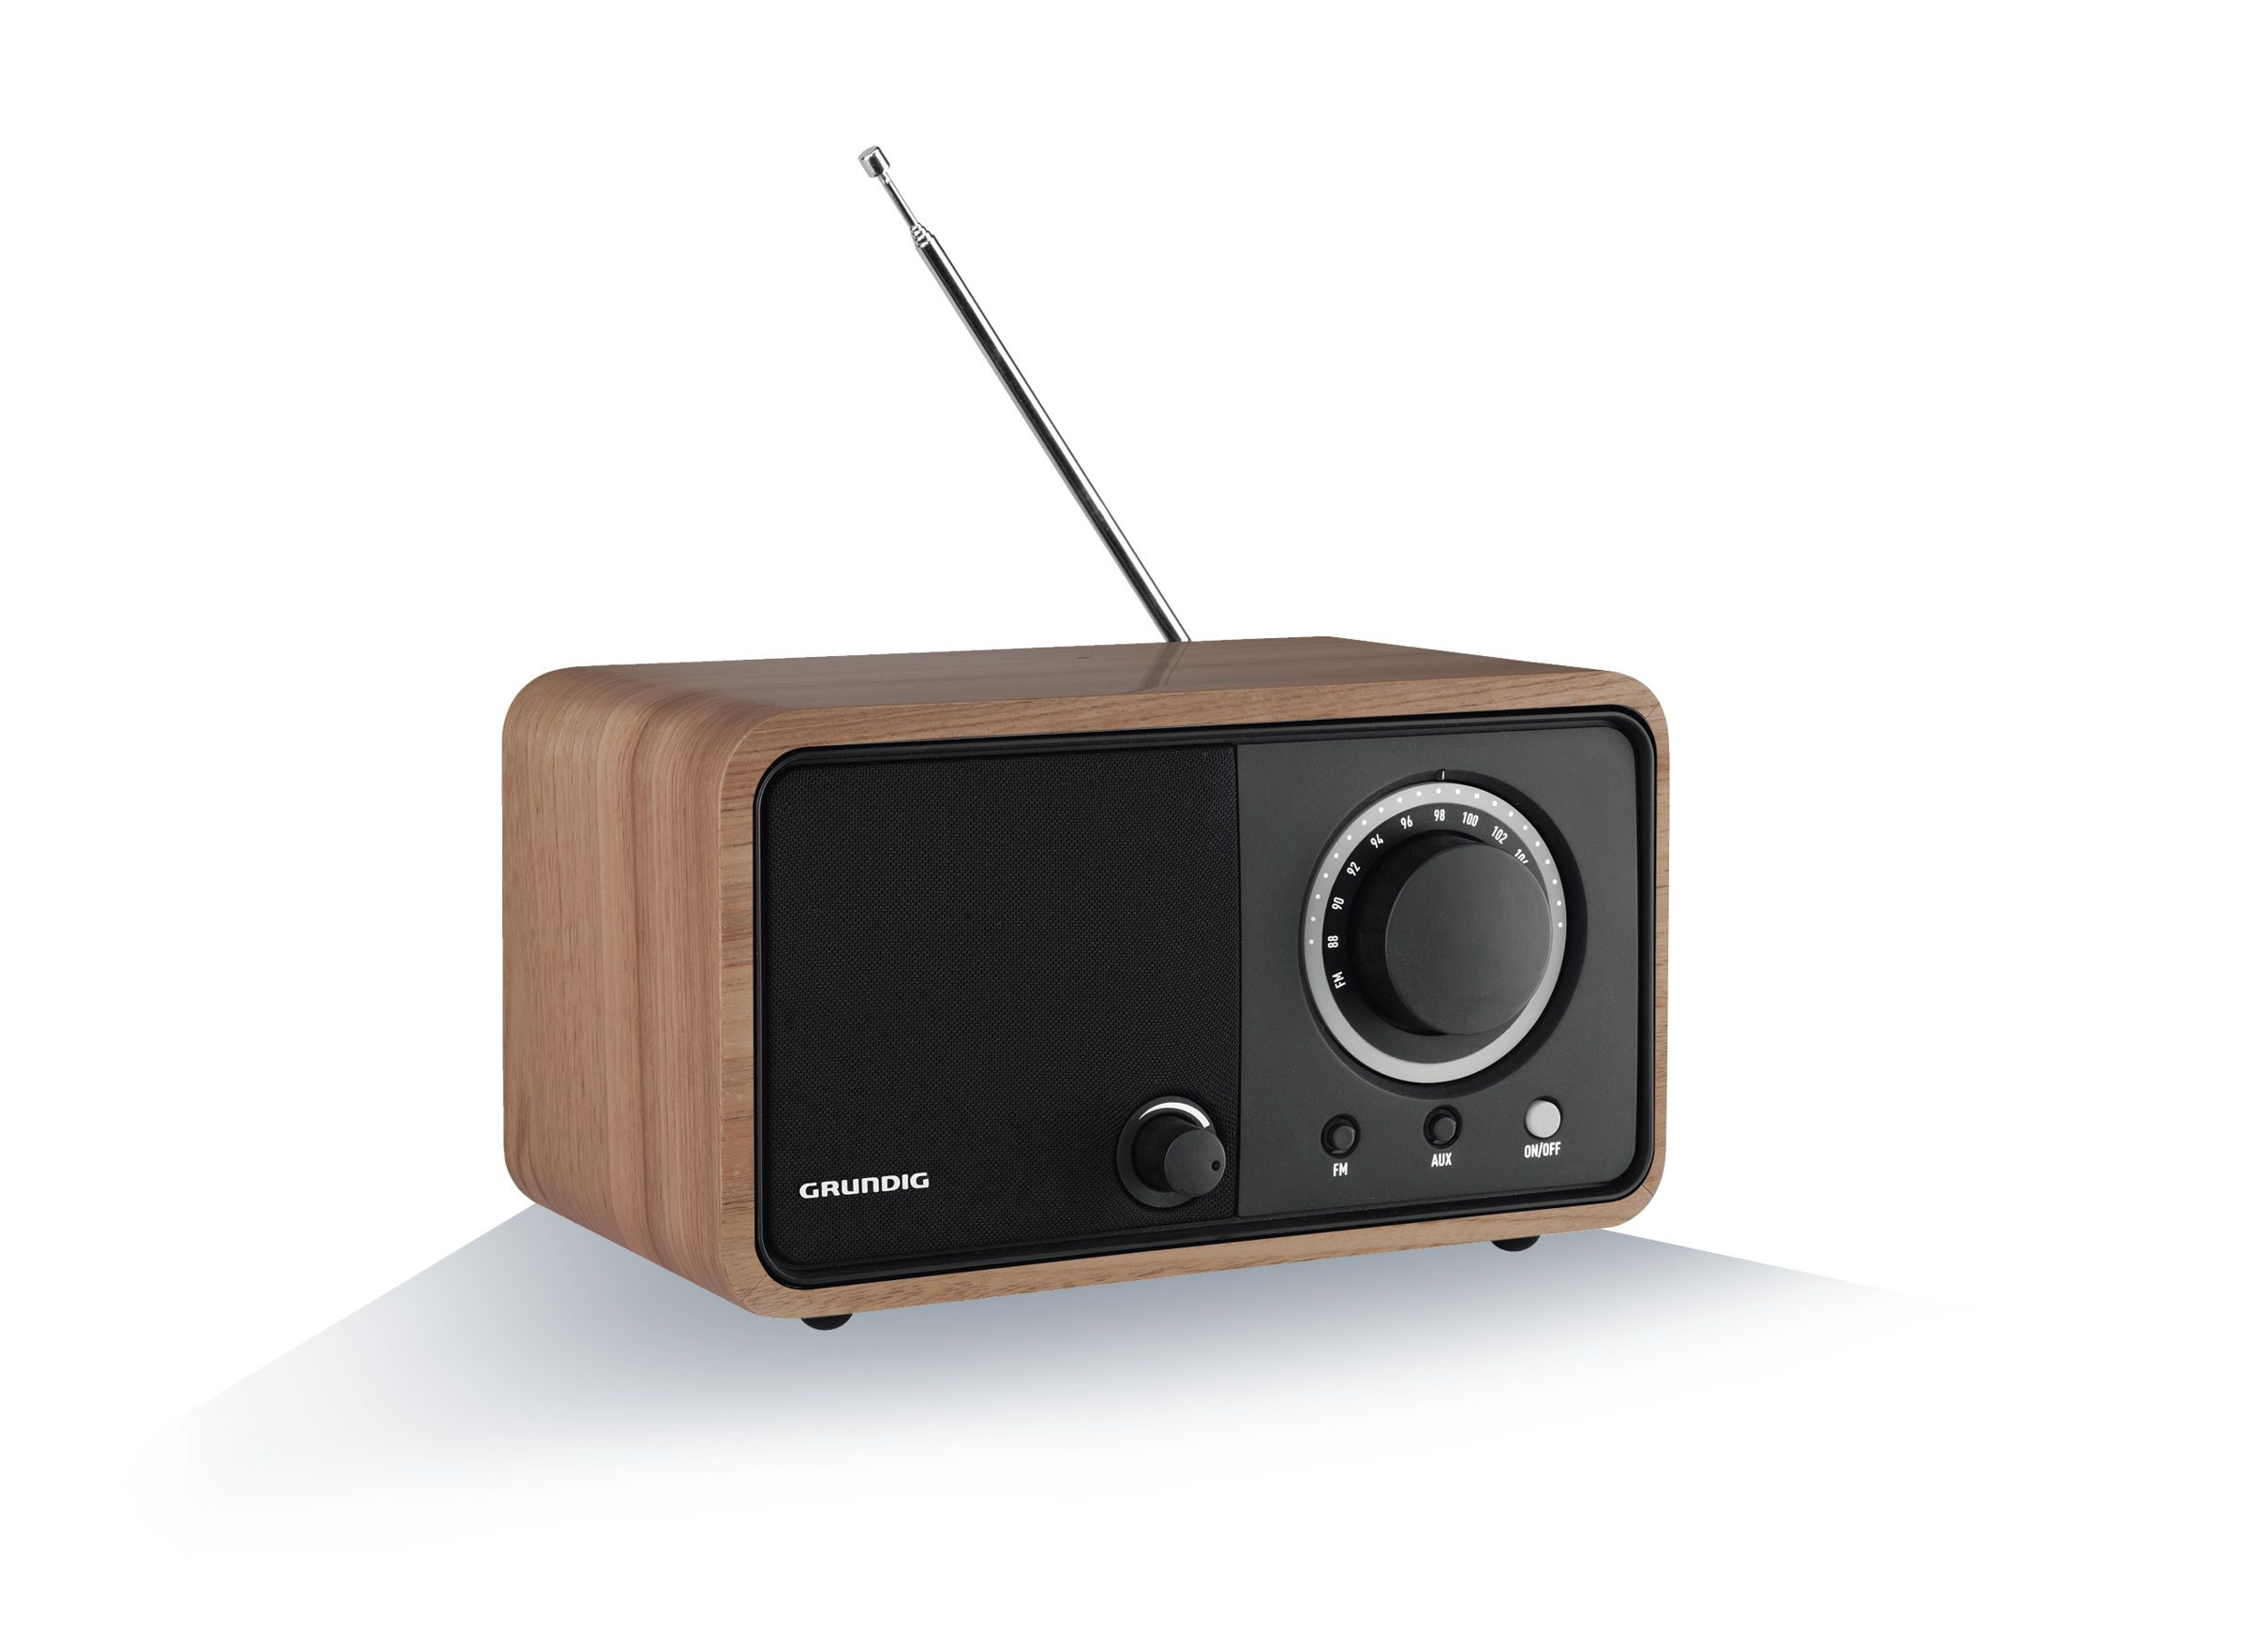 Grundig Bordsradio Tr1200 Brun Finns Pa Radio Tele For 990 Kr In 2020 Unterhaltungselektronik Haushalt Katapult